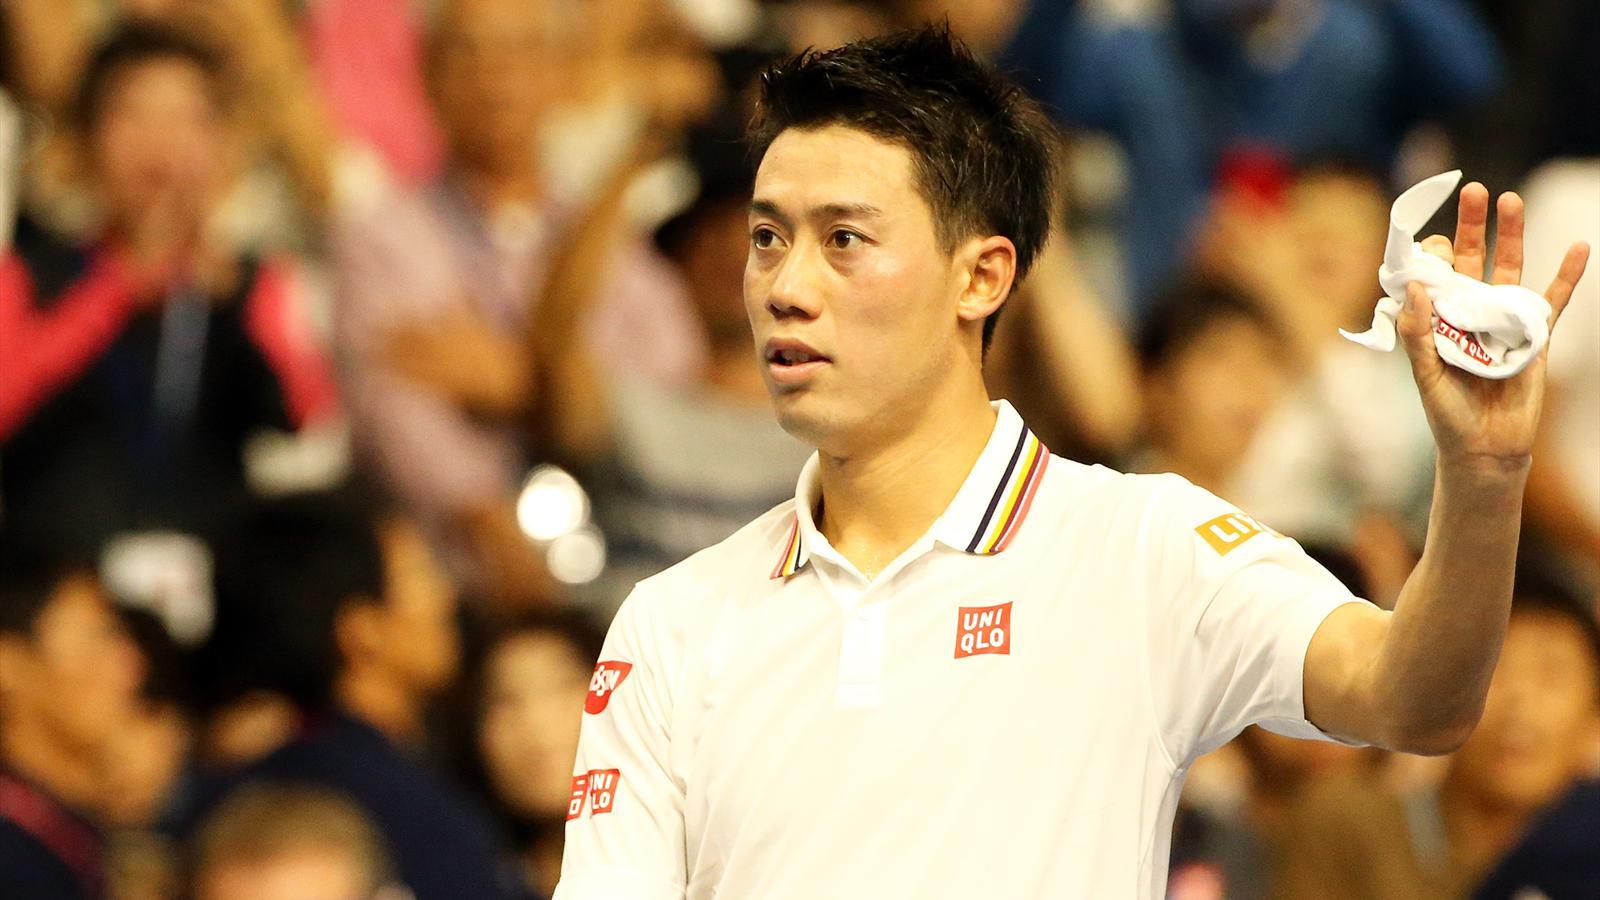 Tennis news - Kei Nishikori through to Japan Open final against Daniil Medvedev - ATP Tokyo 2018 ...